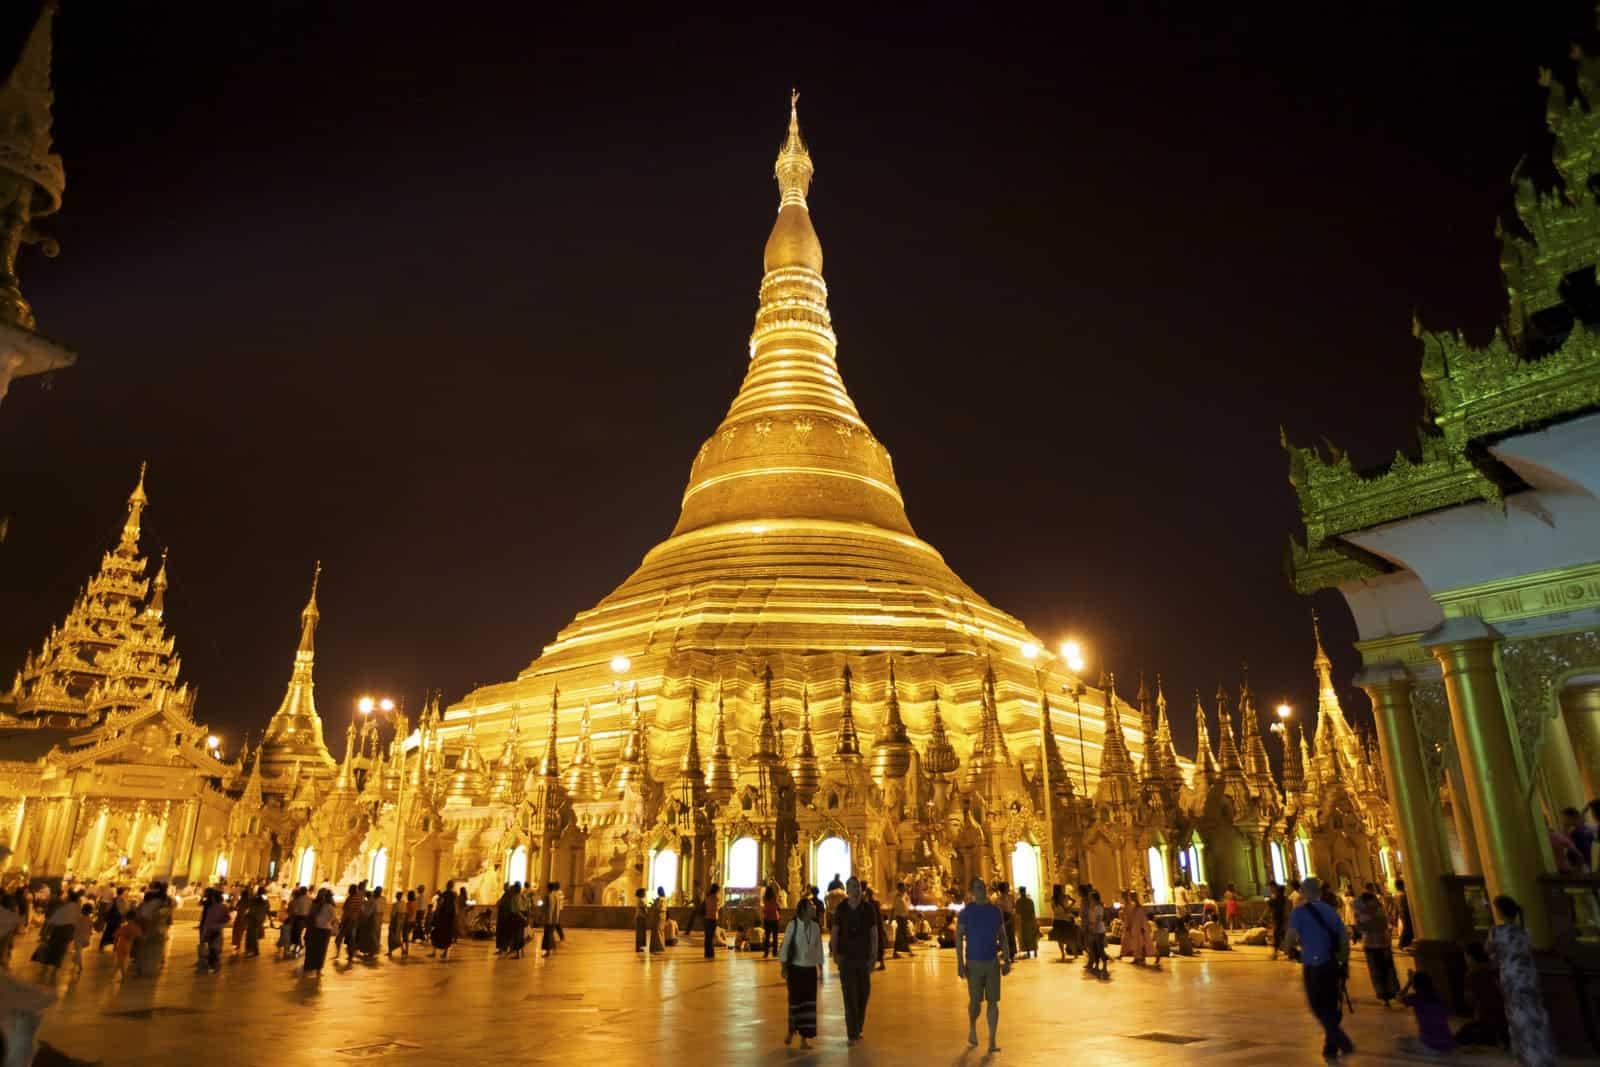 Shwedagon Pagoda, Yangon, Myanmar - Best Temples in Asia